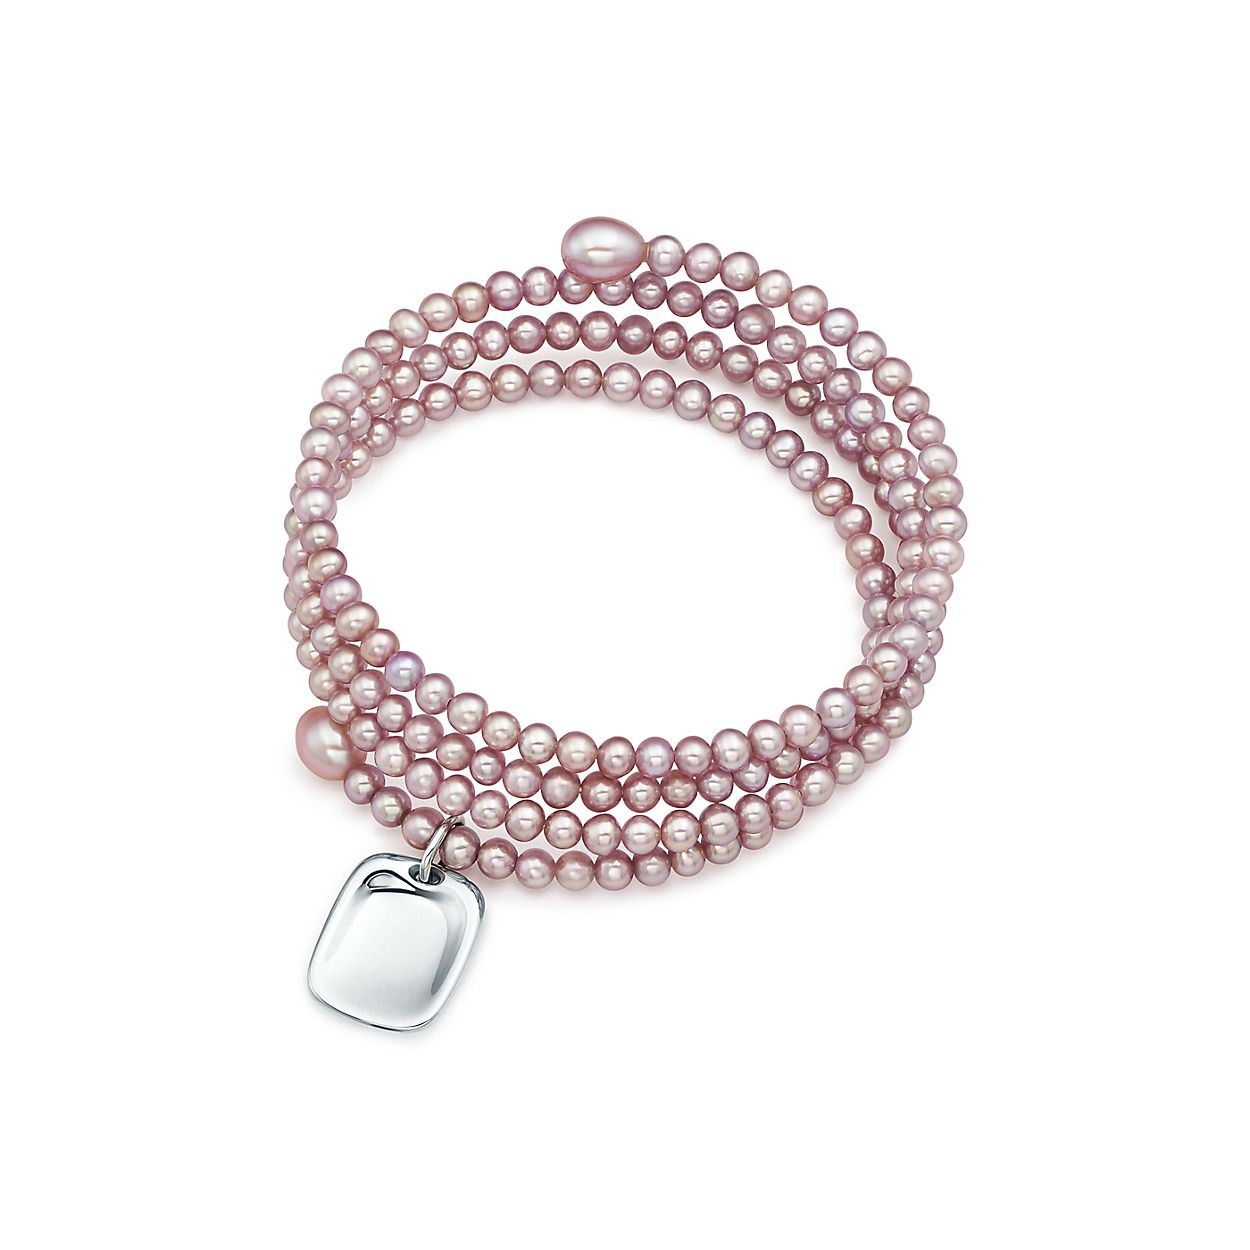 Elsa Peretti Sevillana bracelet in sterling silver with pearls, medium Tiffany & Co.